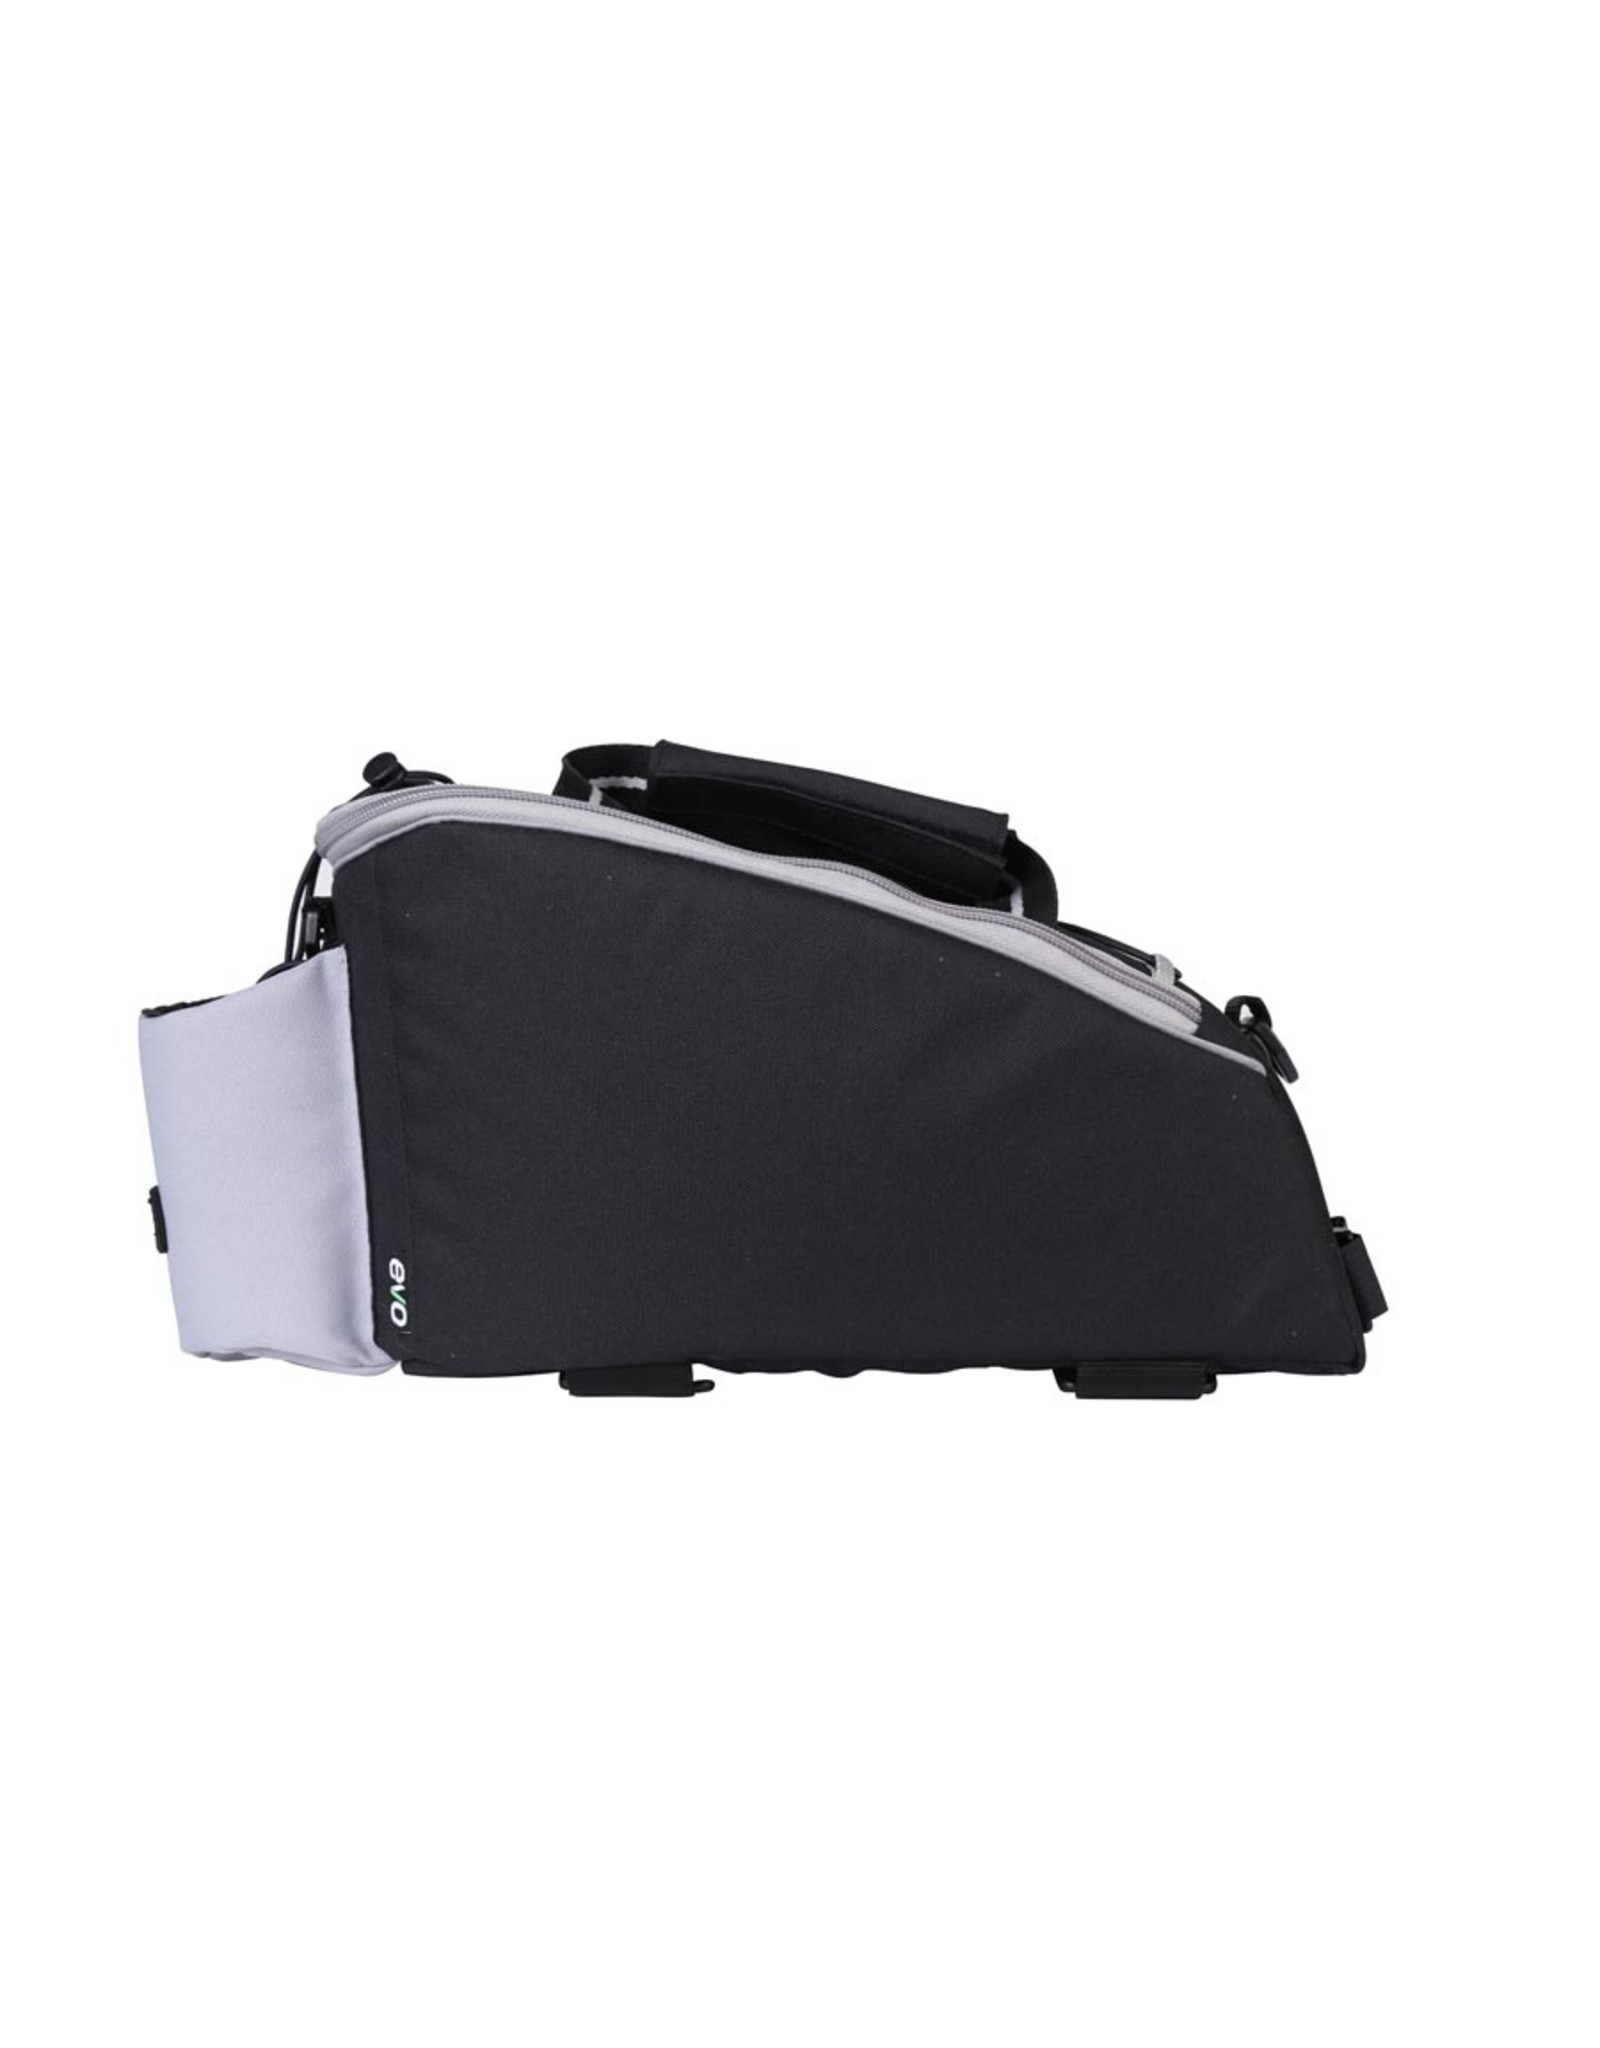 EVO EVO, Clutch HC2, Trunk Bag